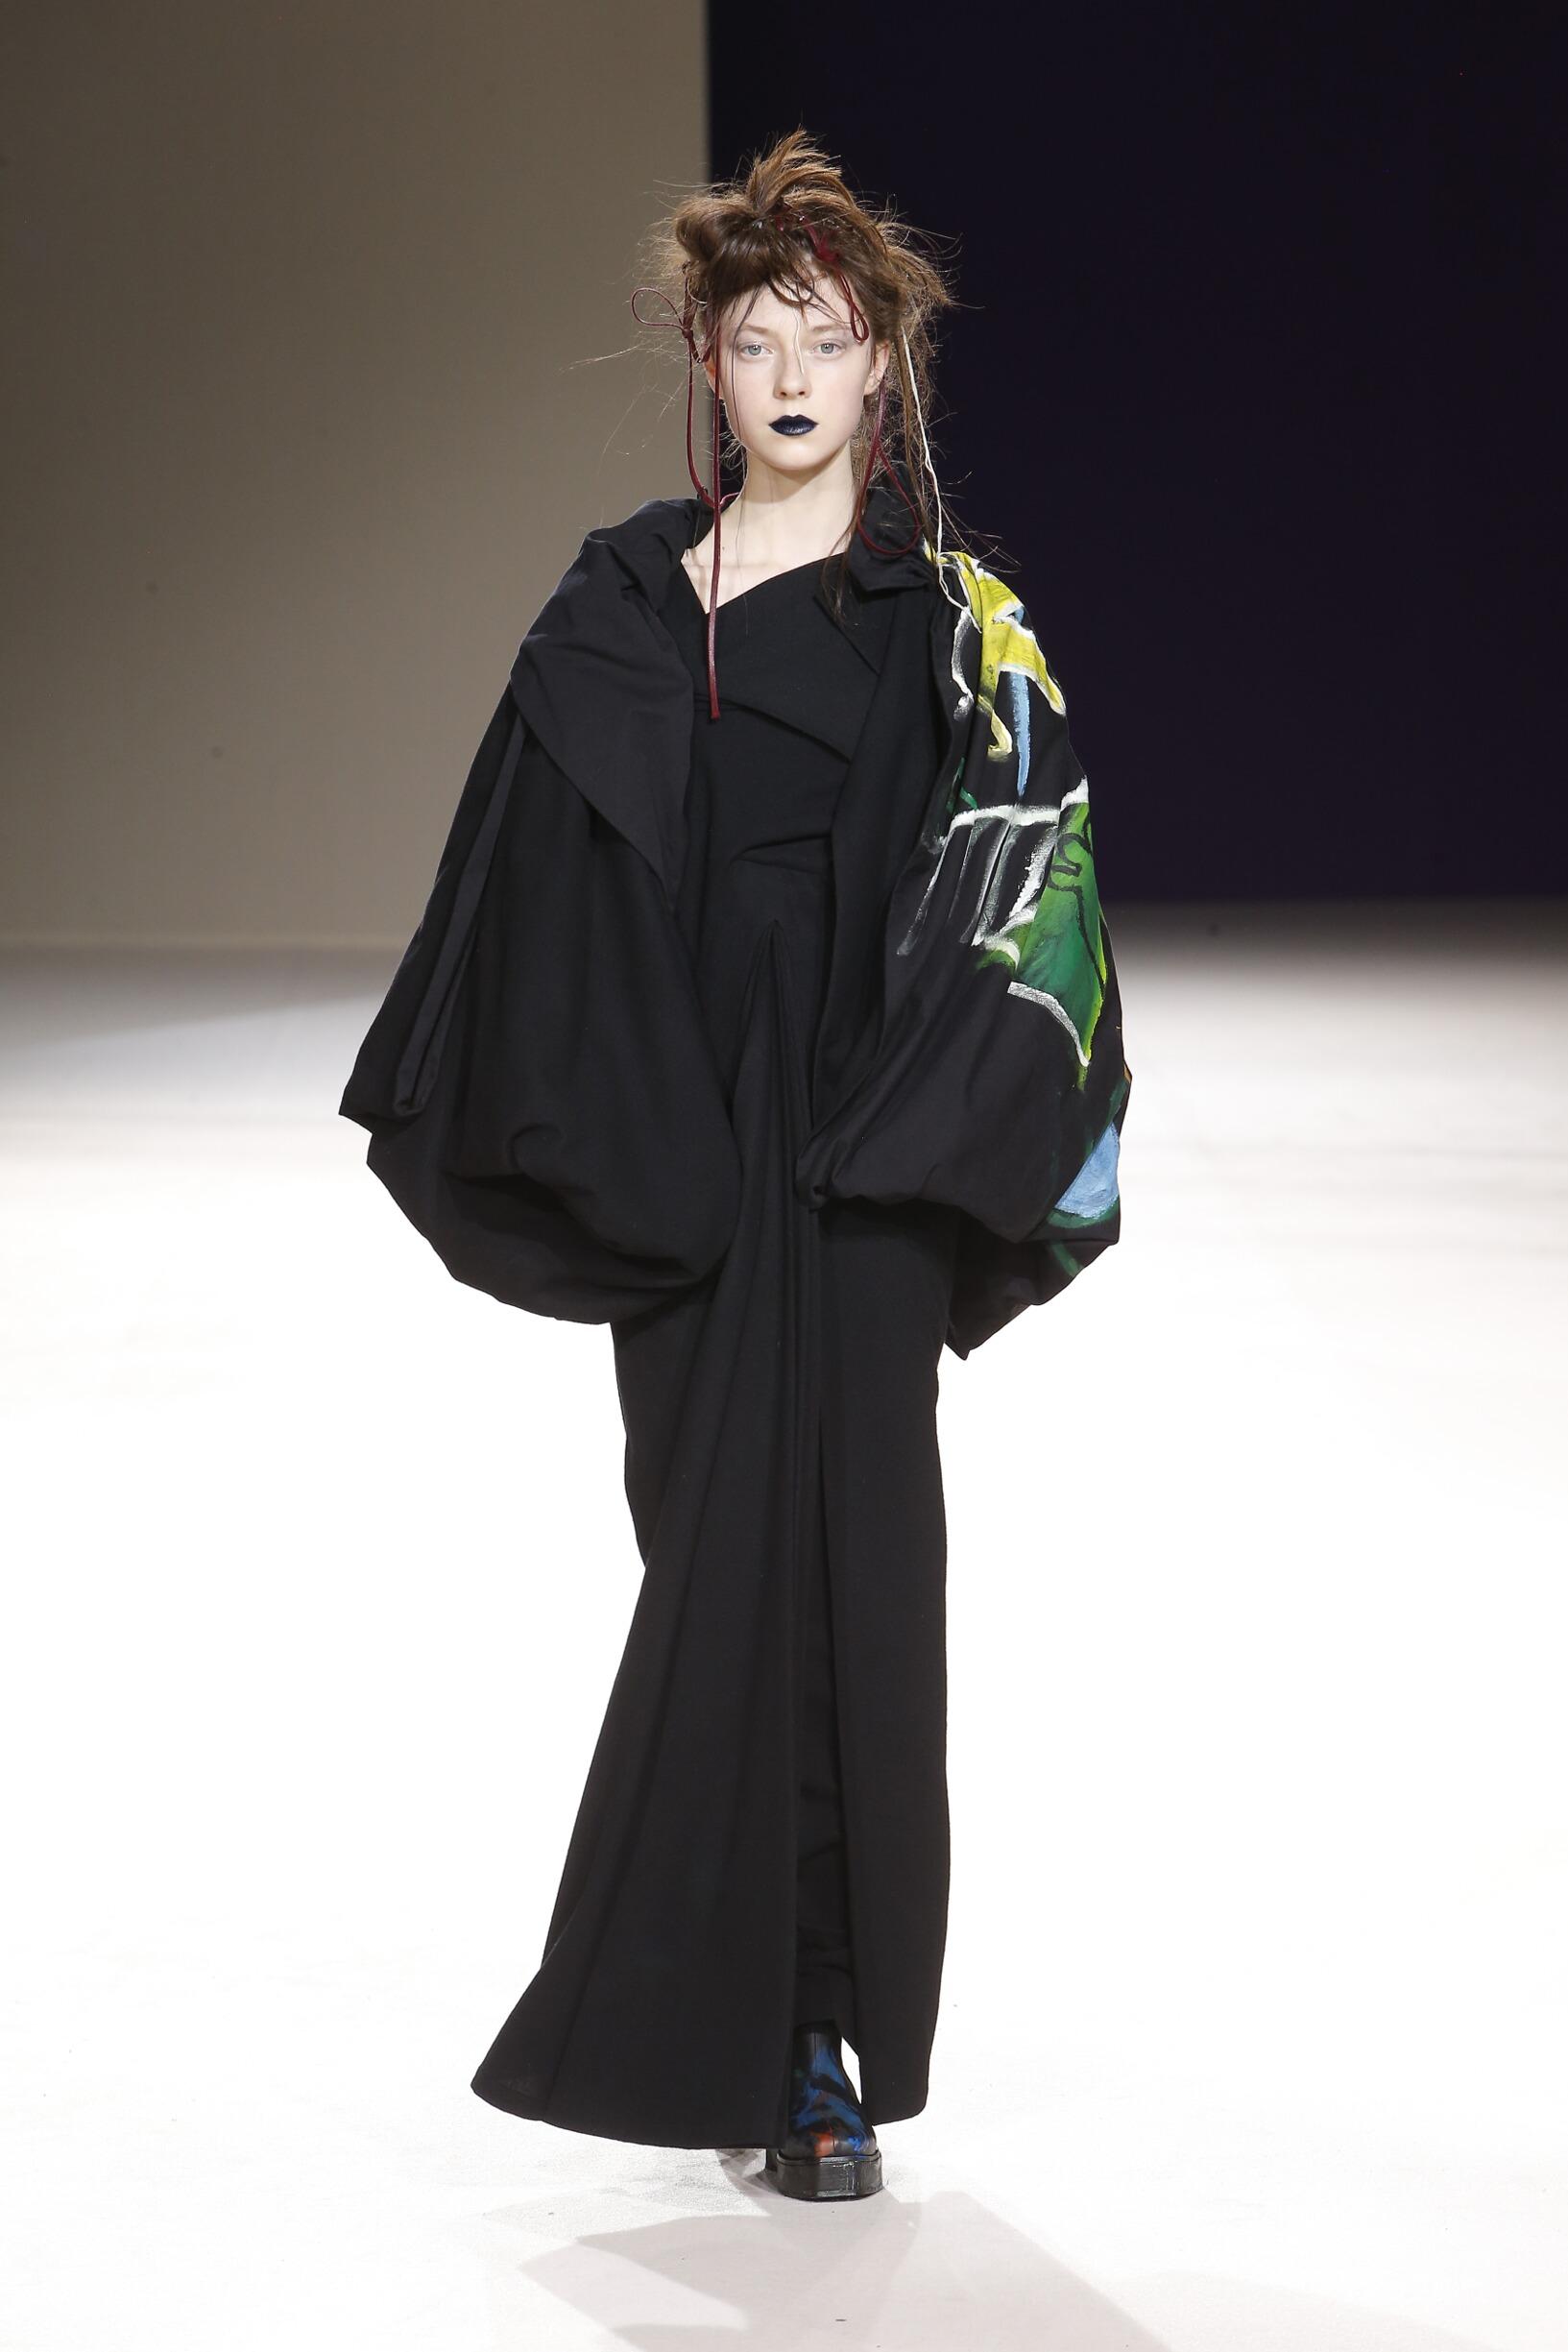 Catwalk Yohji Yamamoto Woman Fashion Show Winter 2019